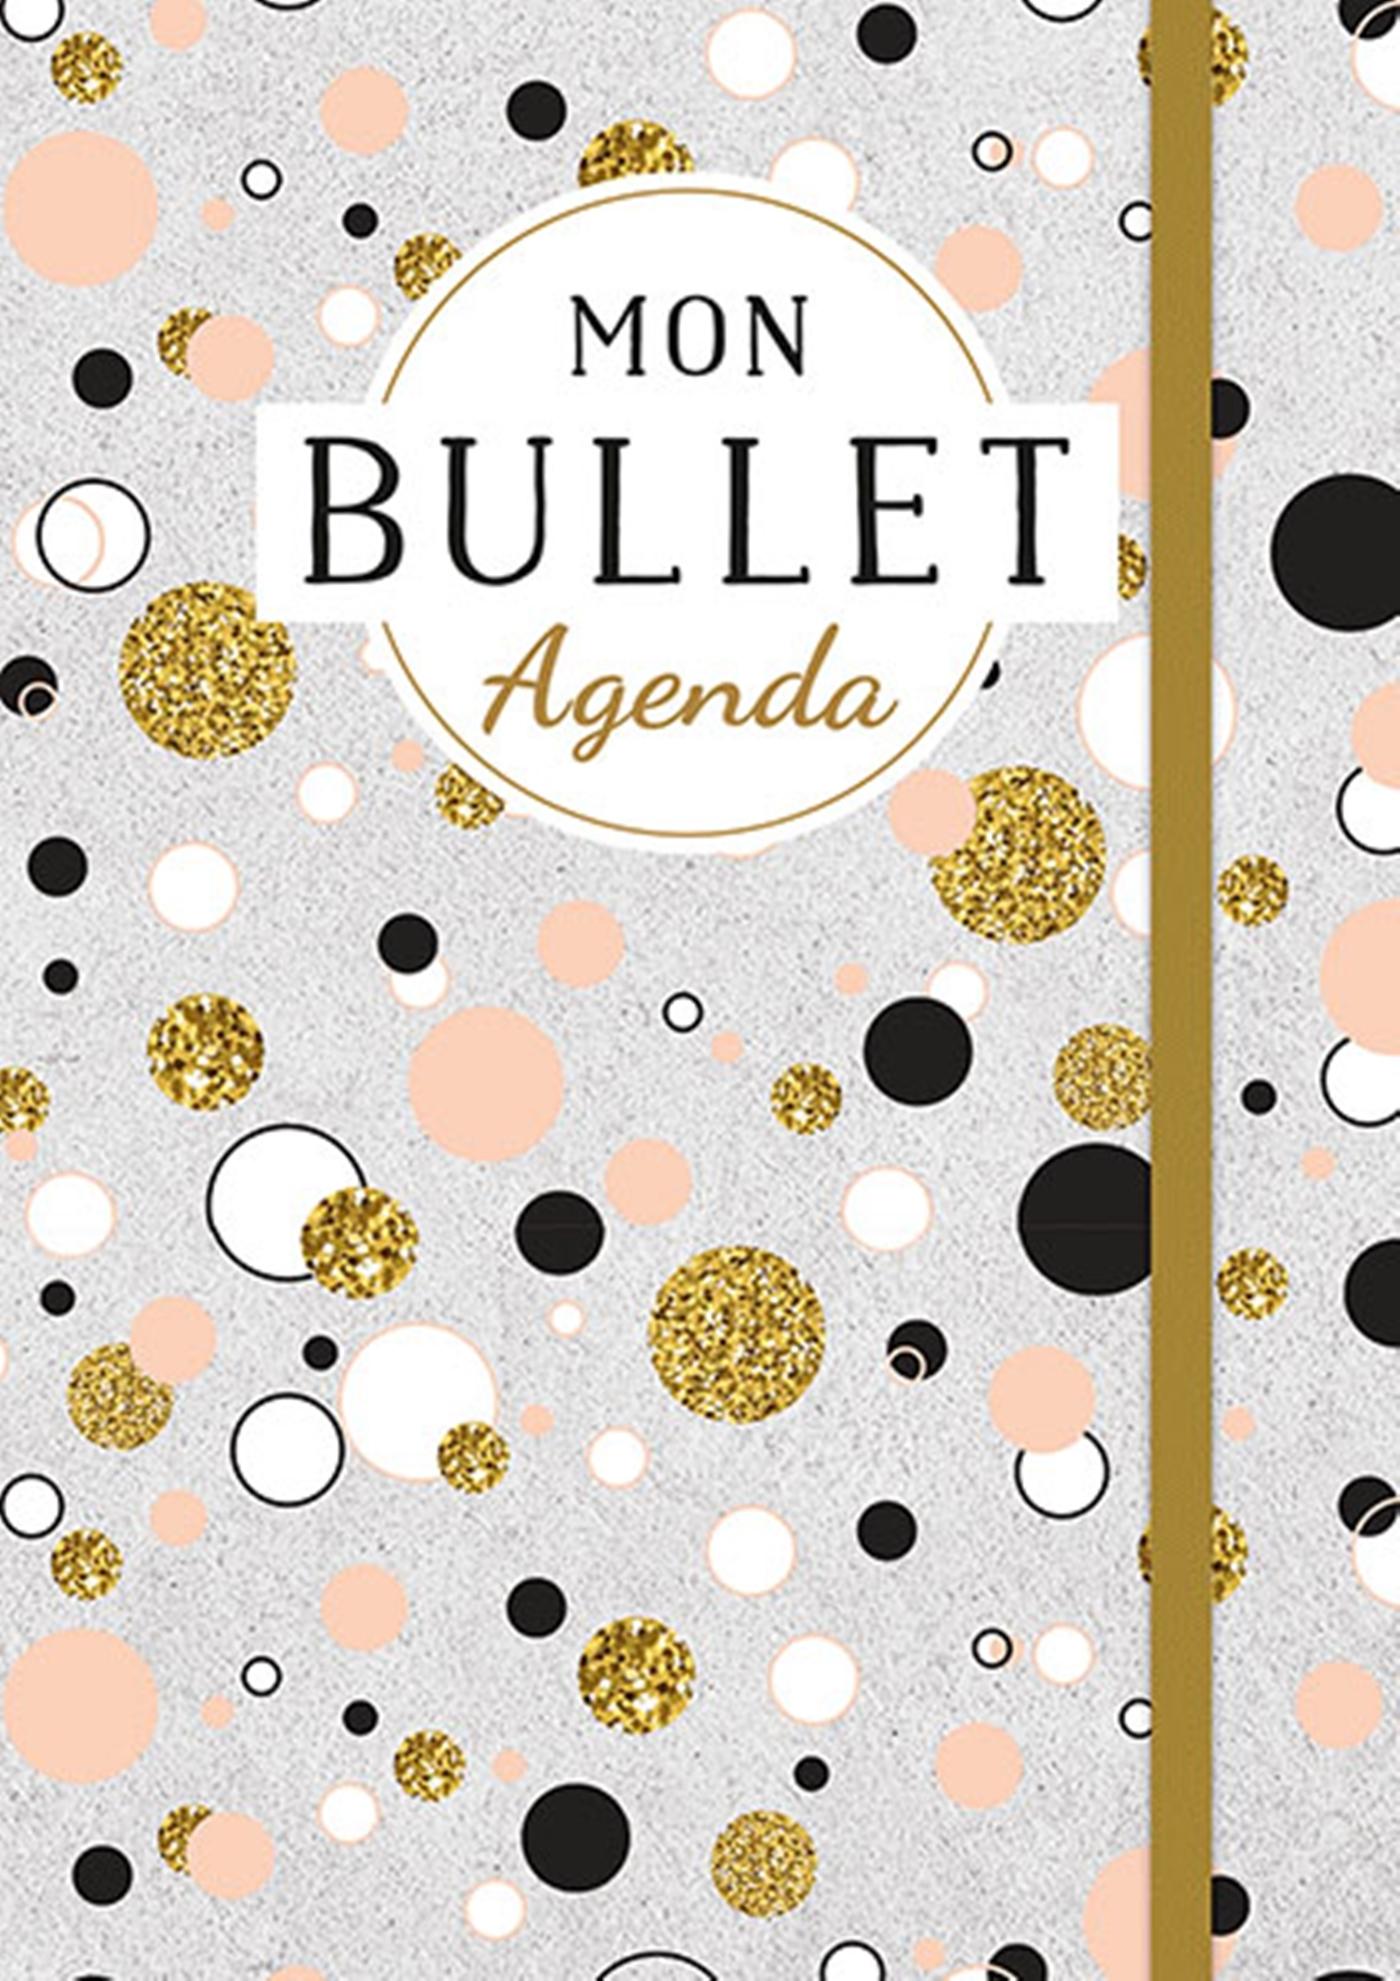 MON BULLET AGENDA (CERCLES)